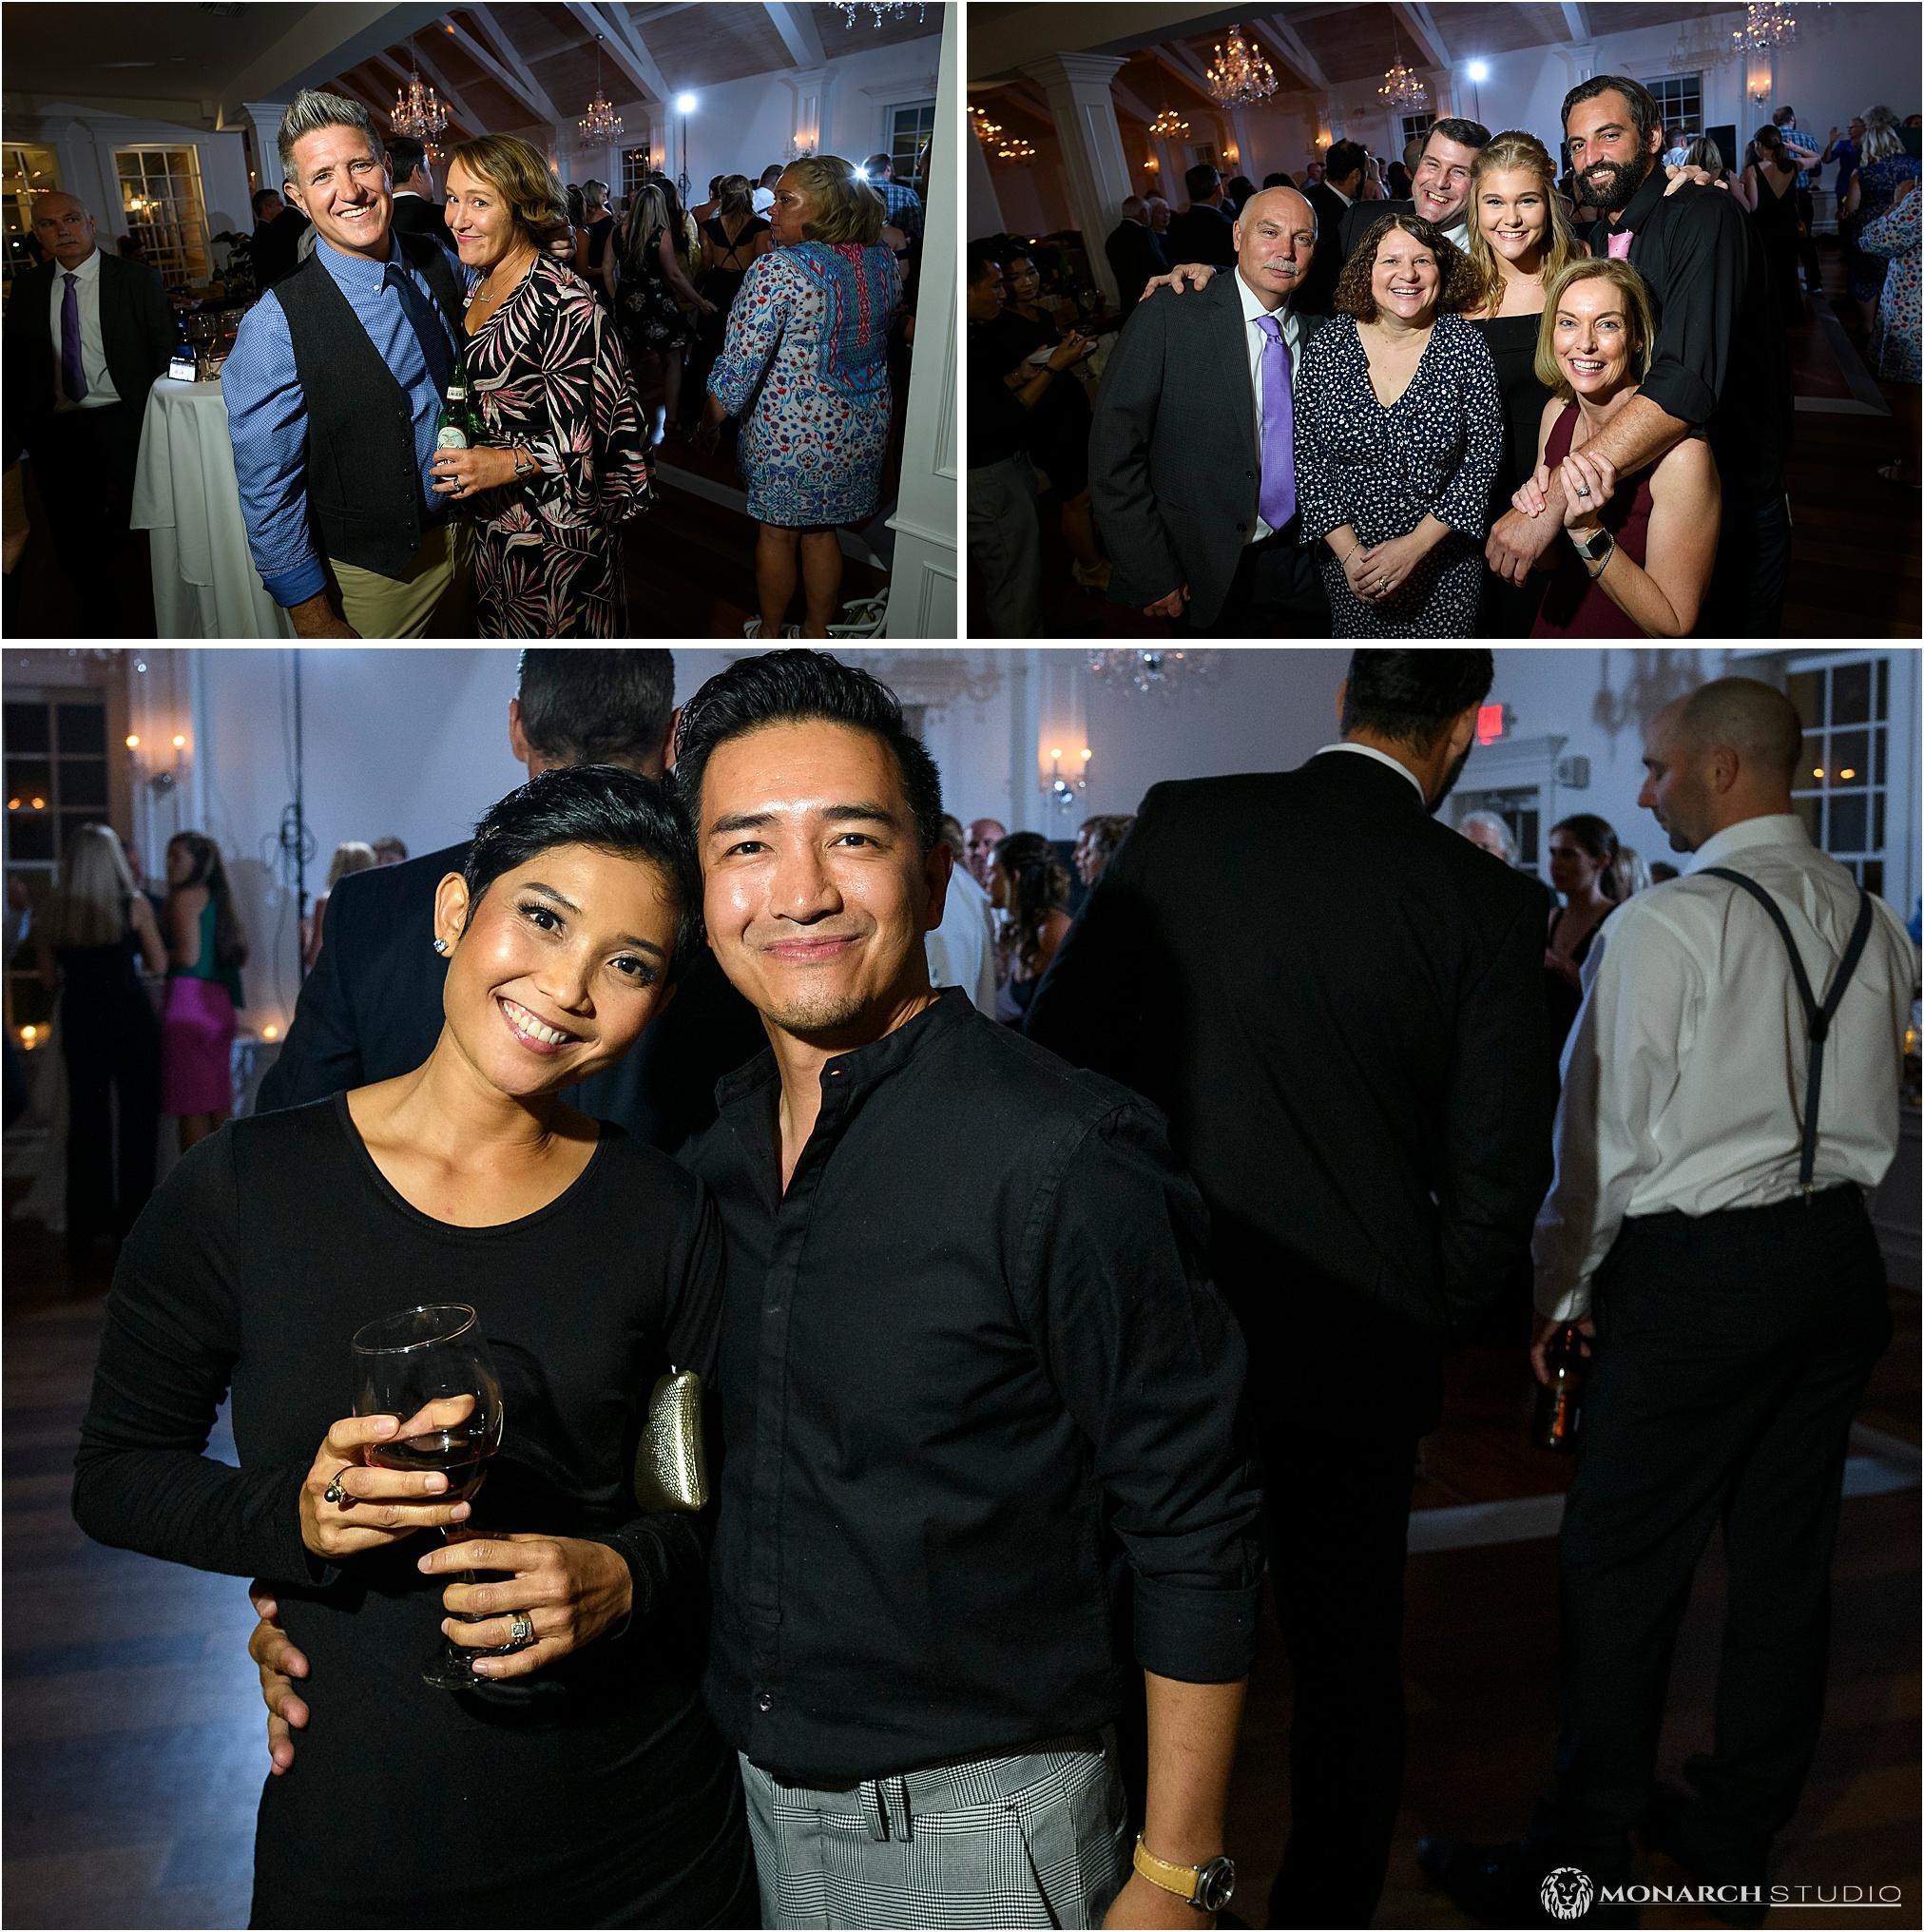 109-whiteroom-wedding-photographer-2019-05-22_0091.jpg